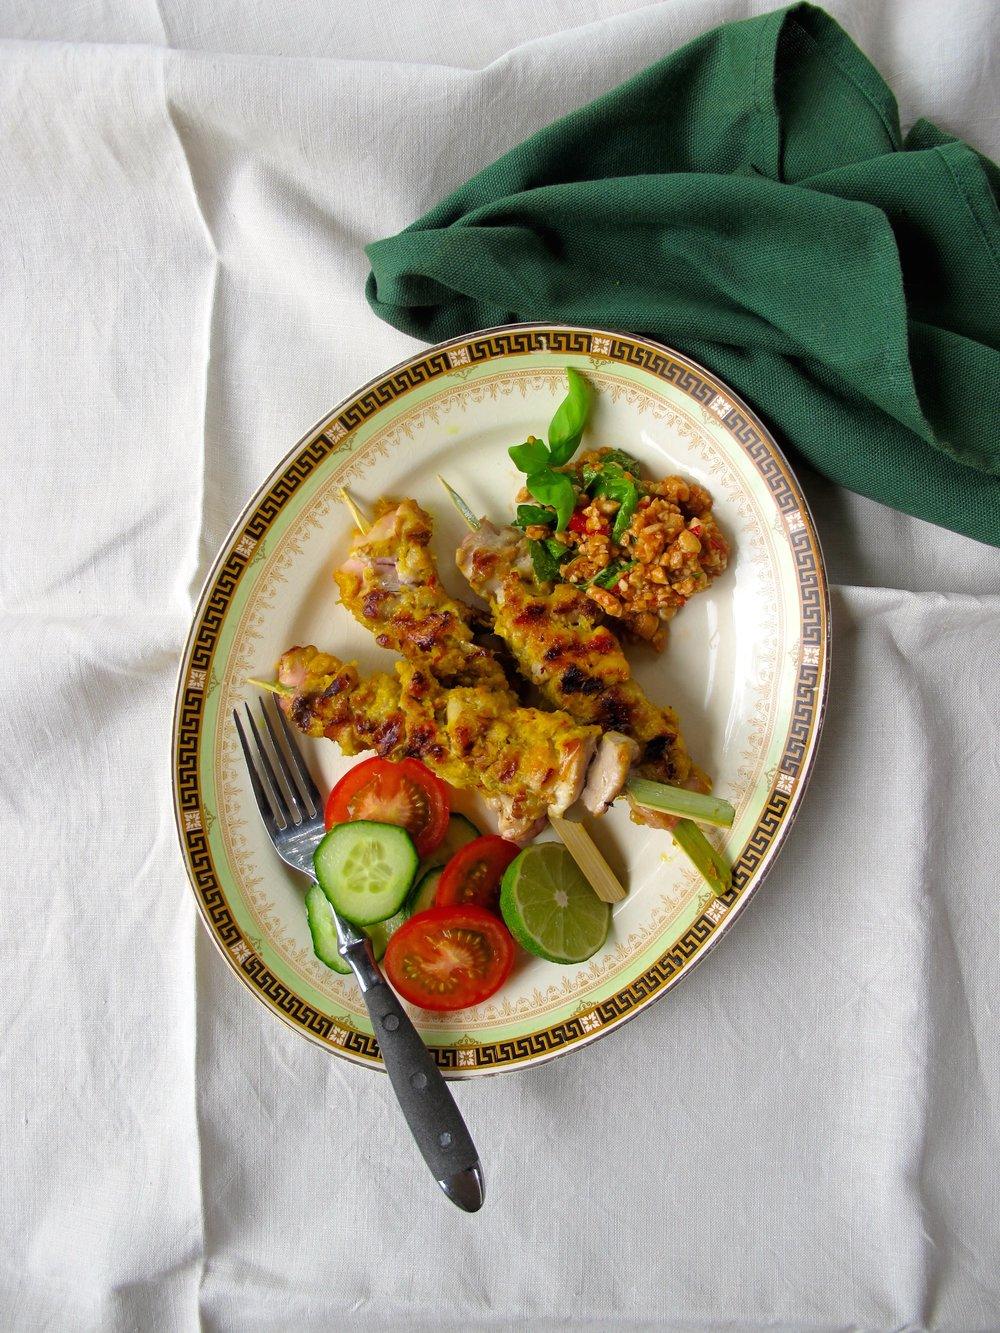 12.-Balinese-Chicken-Skewers-with-Peanut-Chutney.jpg